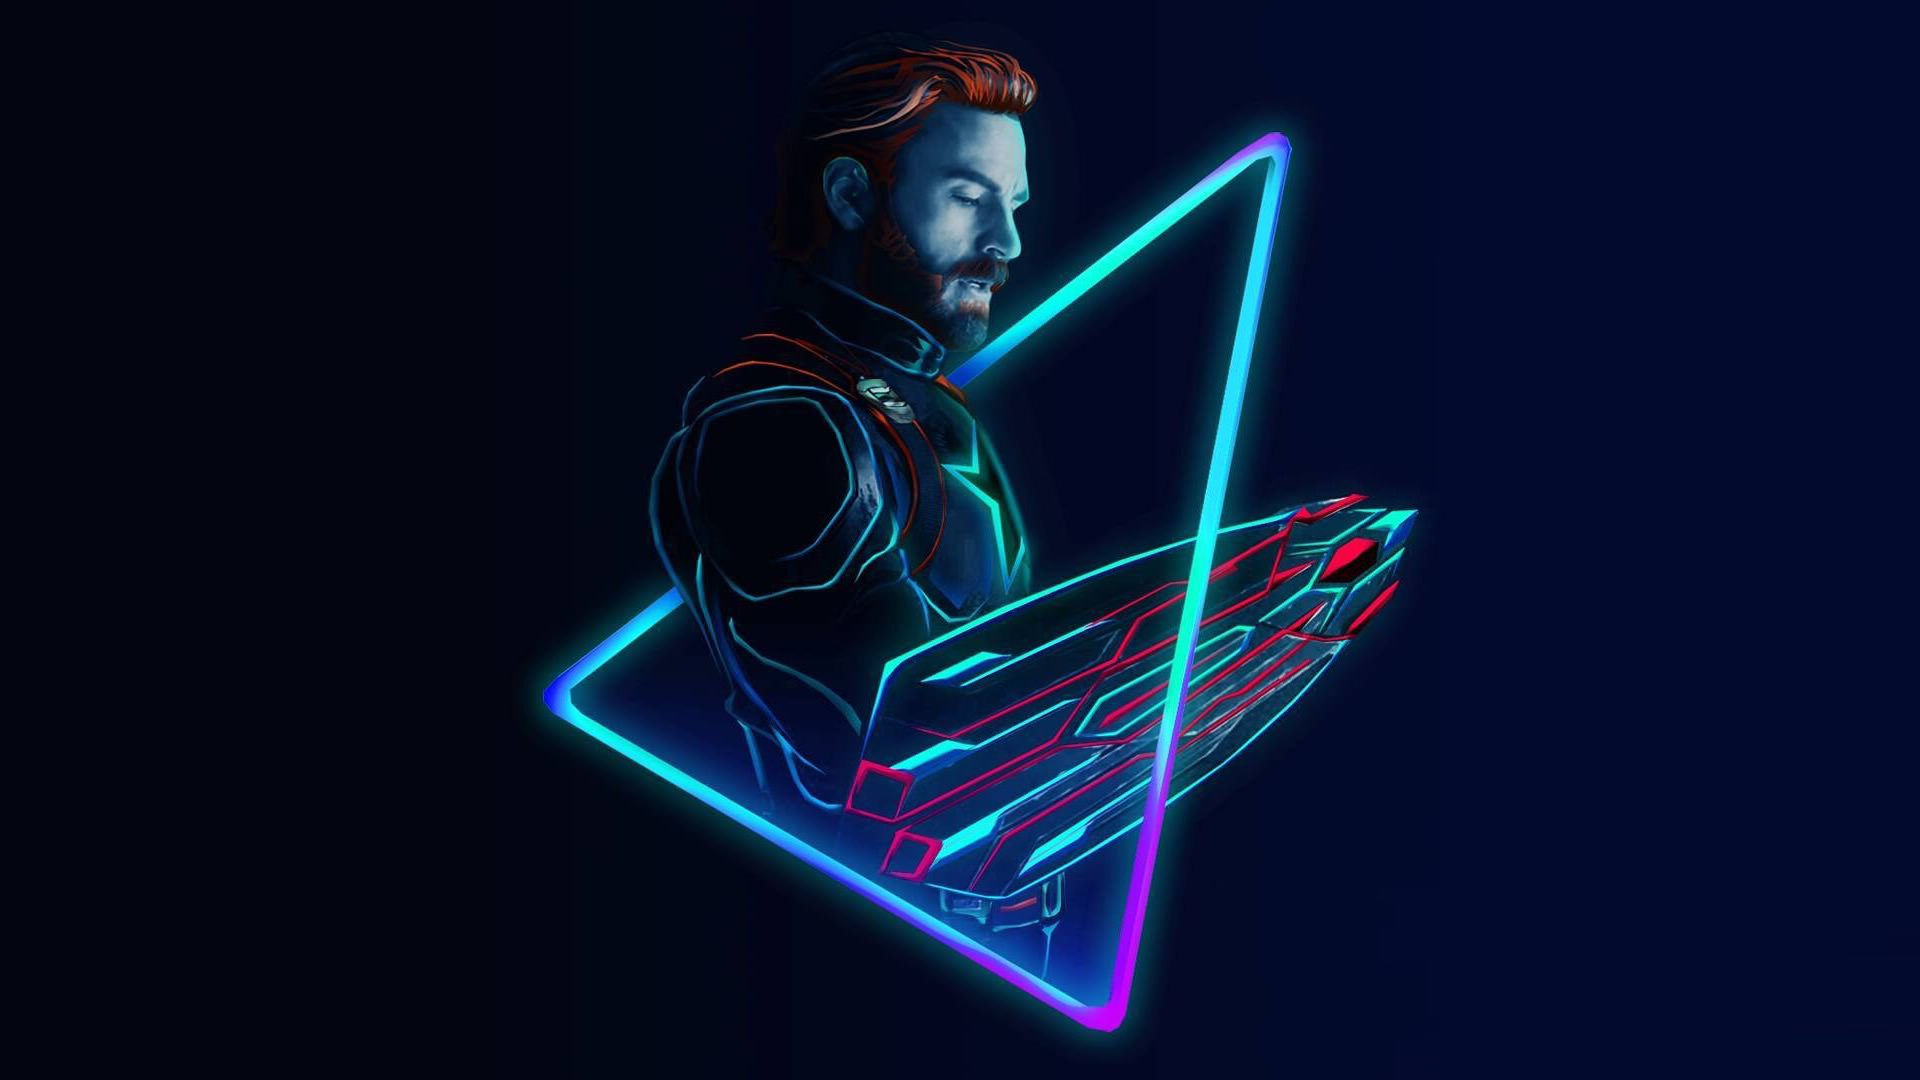 خلفيات كمبيوتر( نيون ) - neon wallpapers